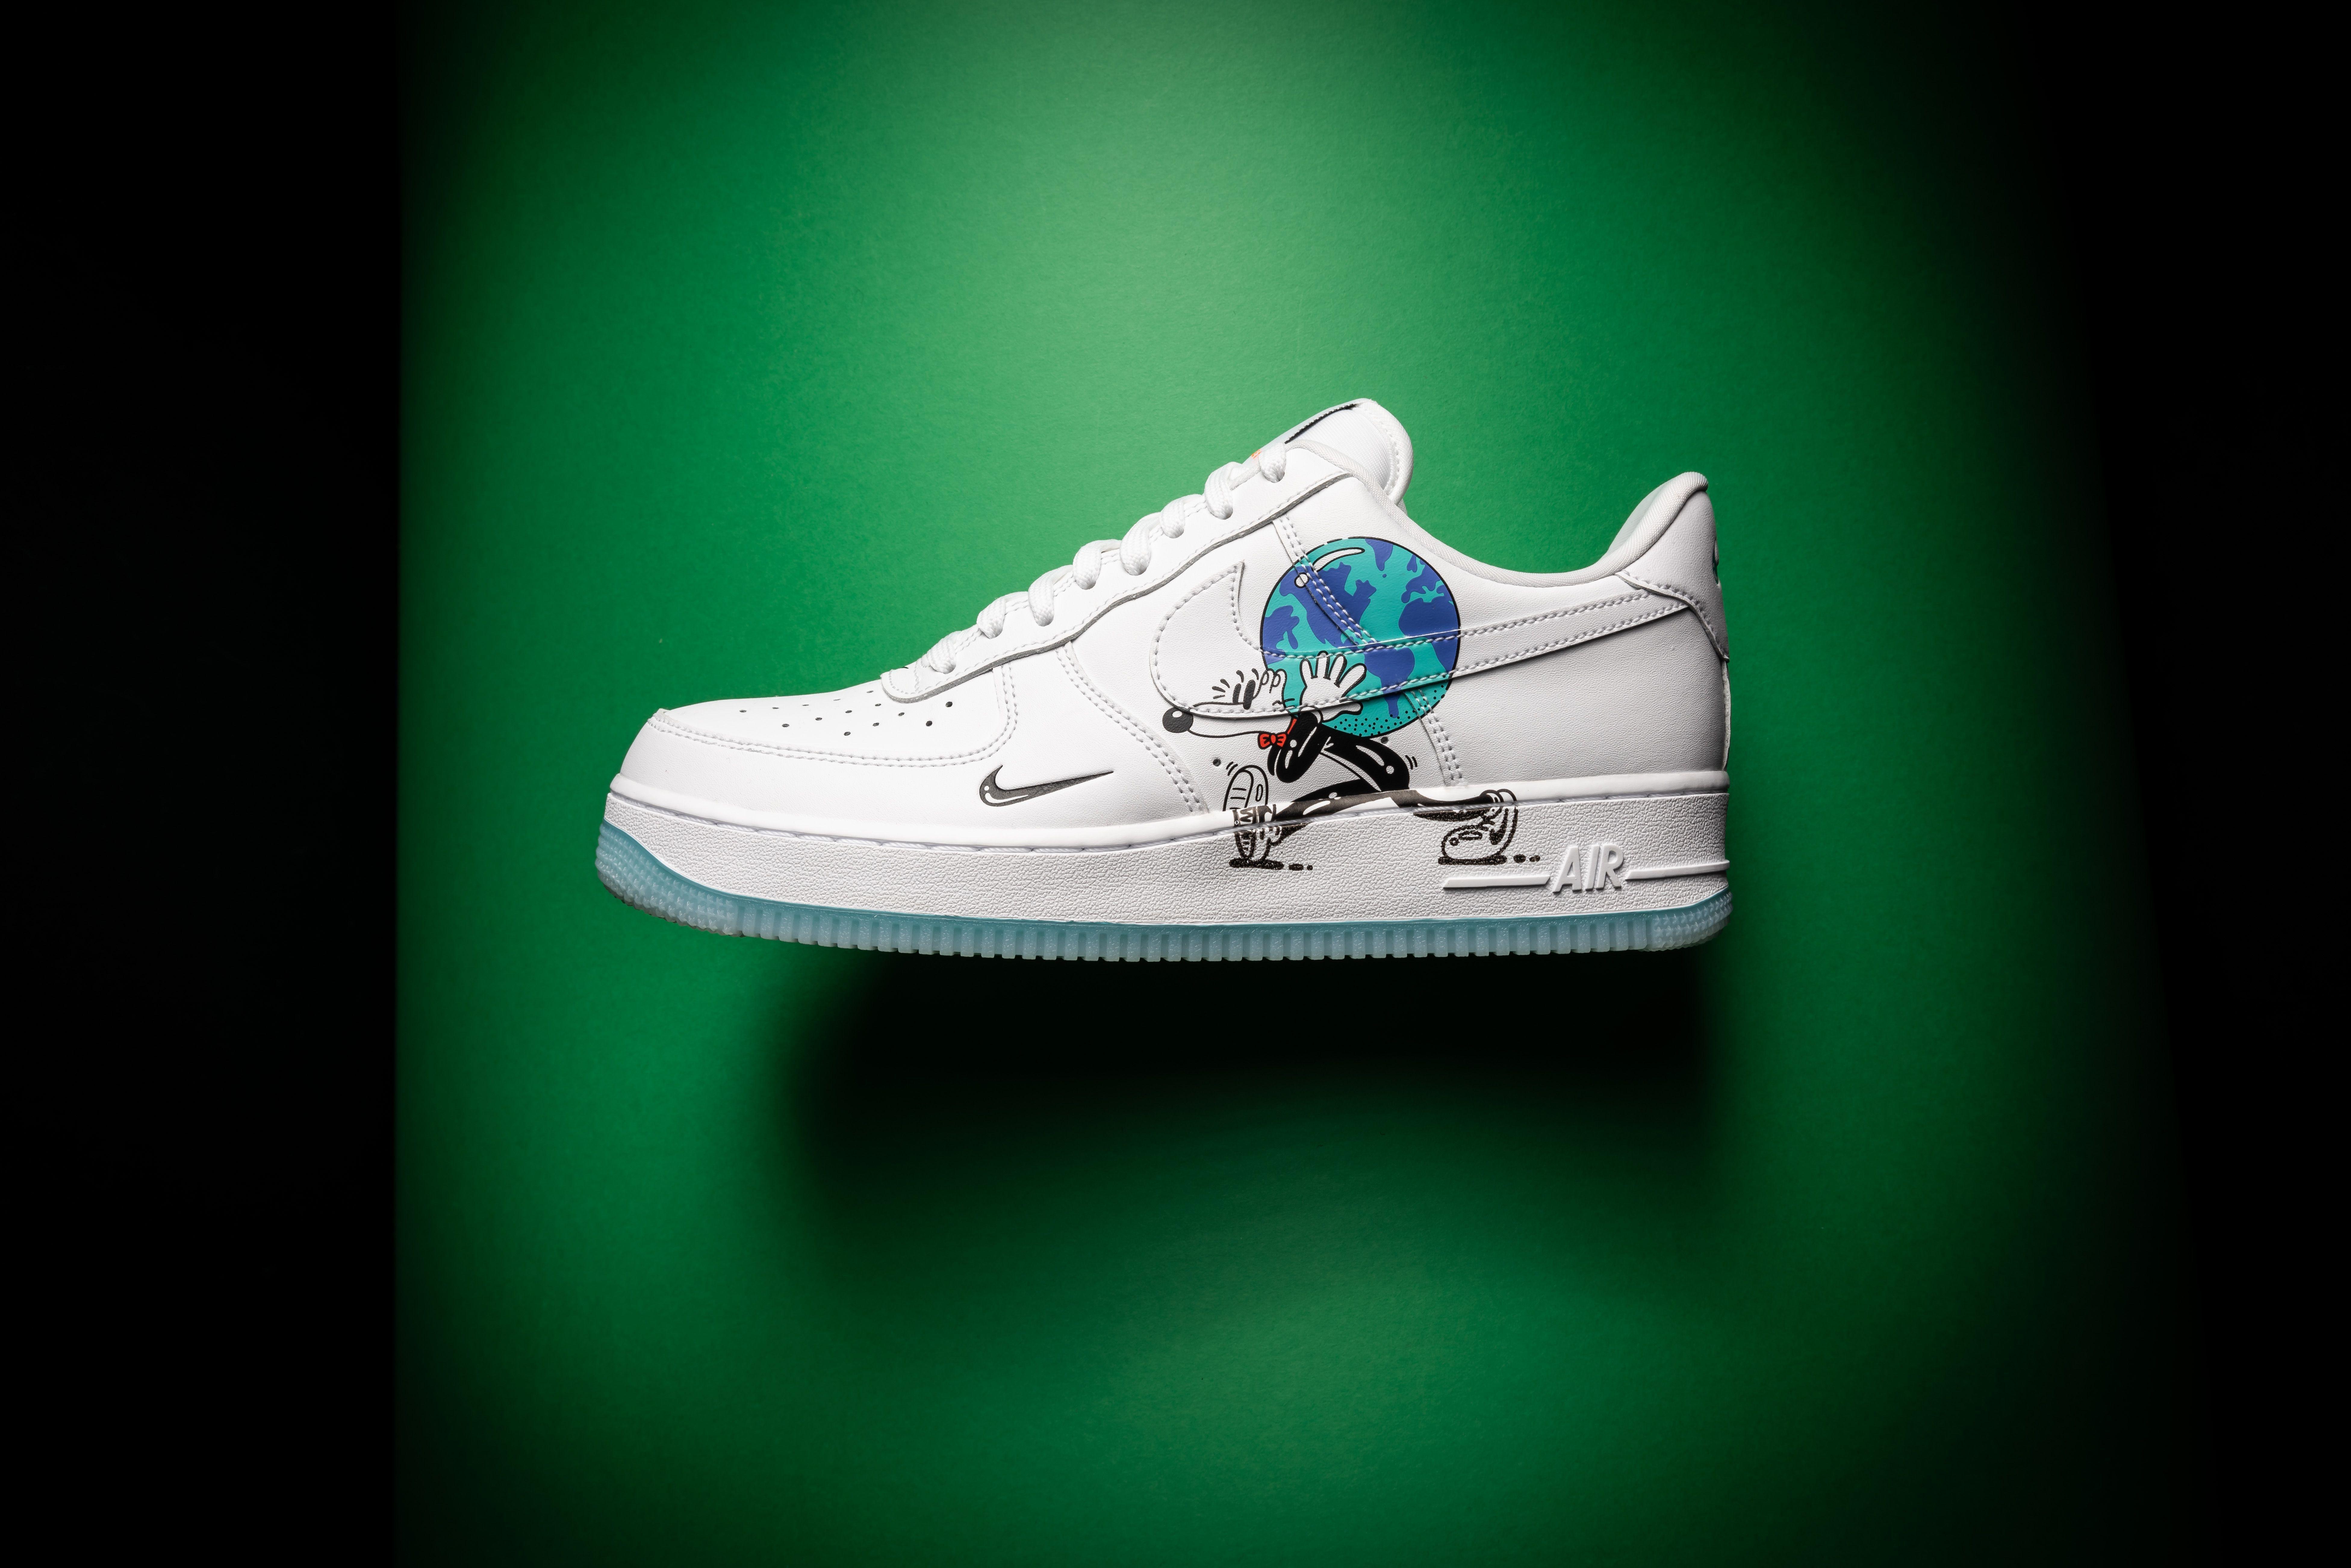 Nike Air Force 1 Flyleather Steve Harrington Earth Day Size